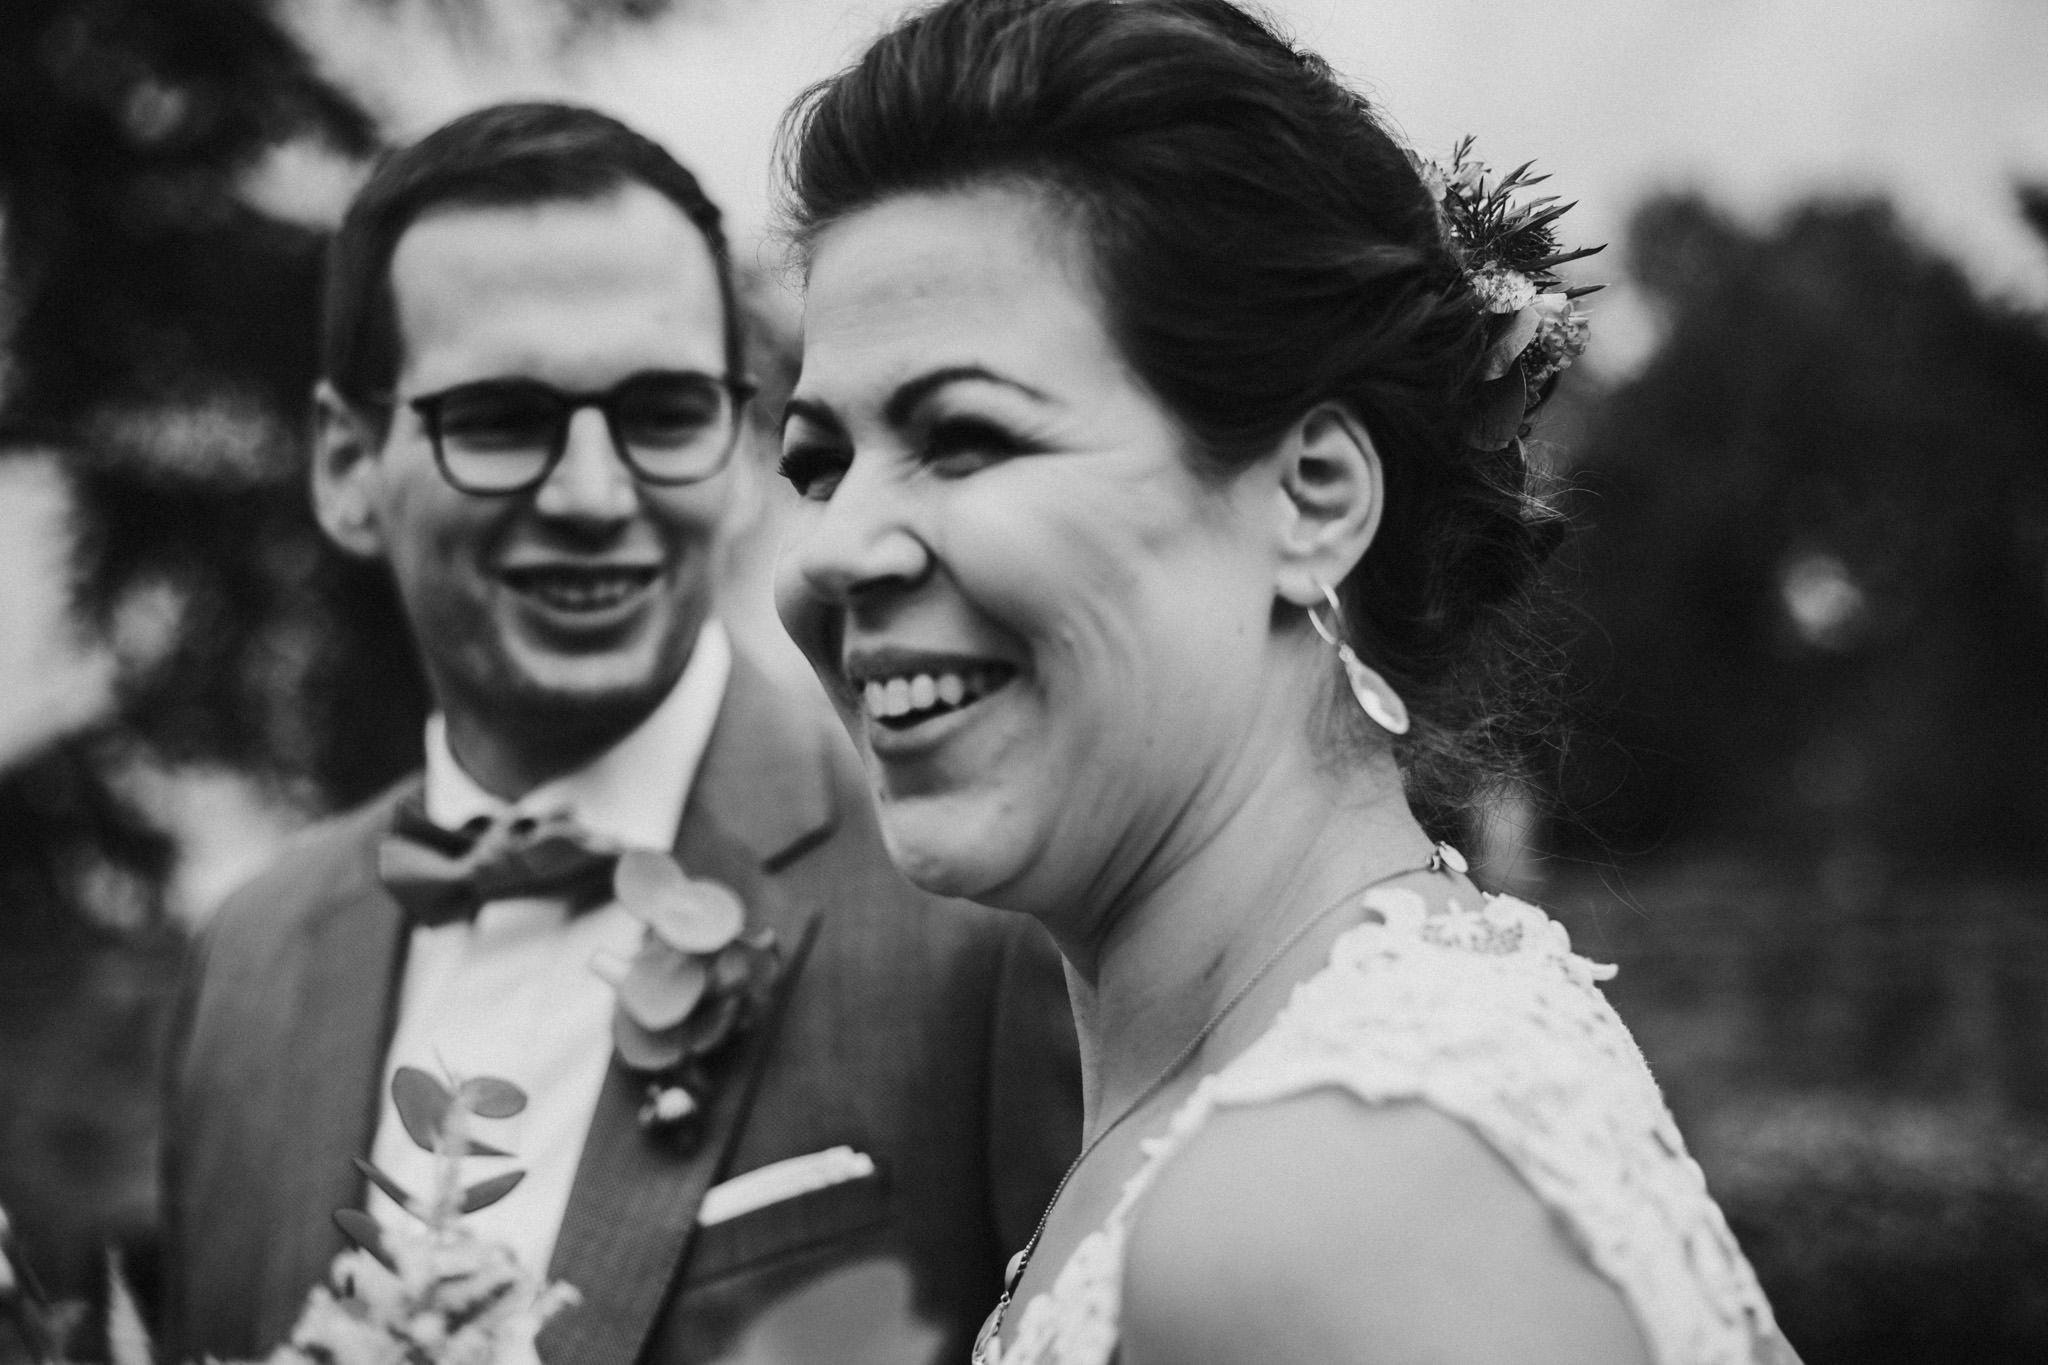 Hochzeitsfotograf-Homberg-47.jpg